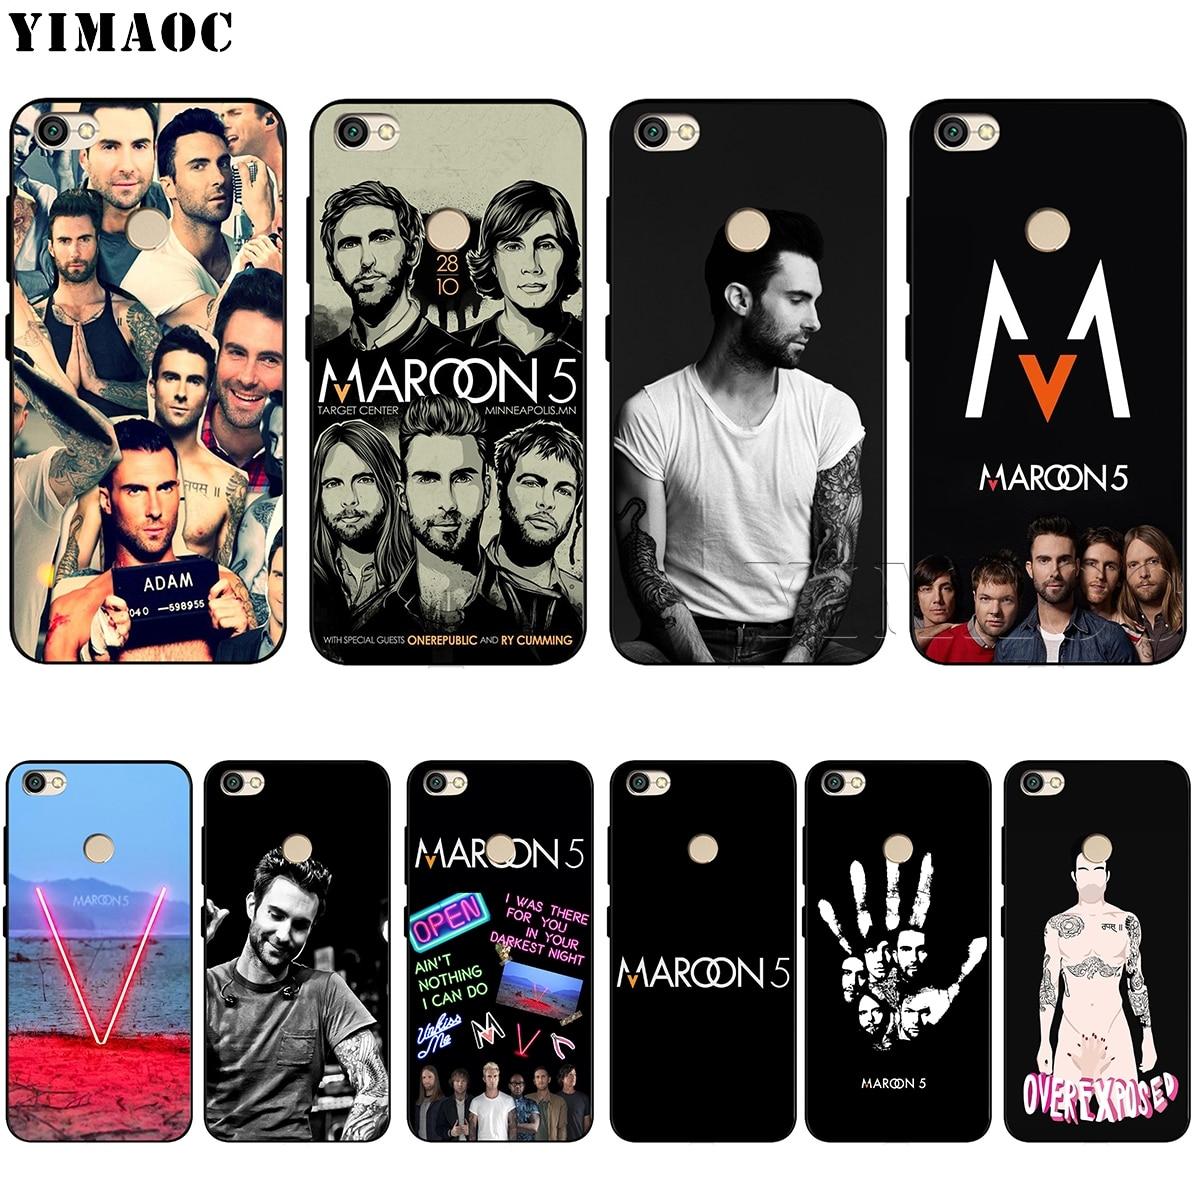 YIMAOC Maroon 5 Adam Levine Soft Silicone Case for Xiaomi Redmi Note 4 4X 4A 5 5A 6 MI A1 mi6 Prime Plus